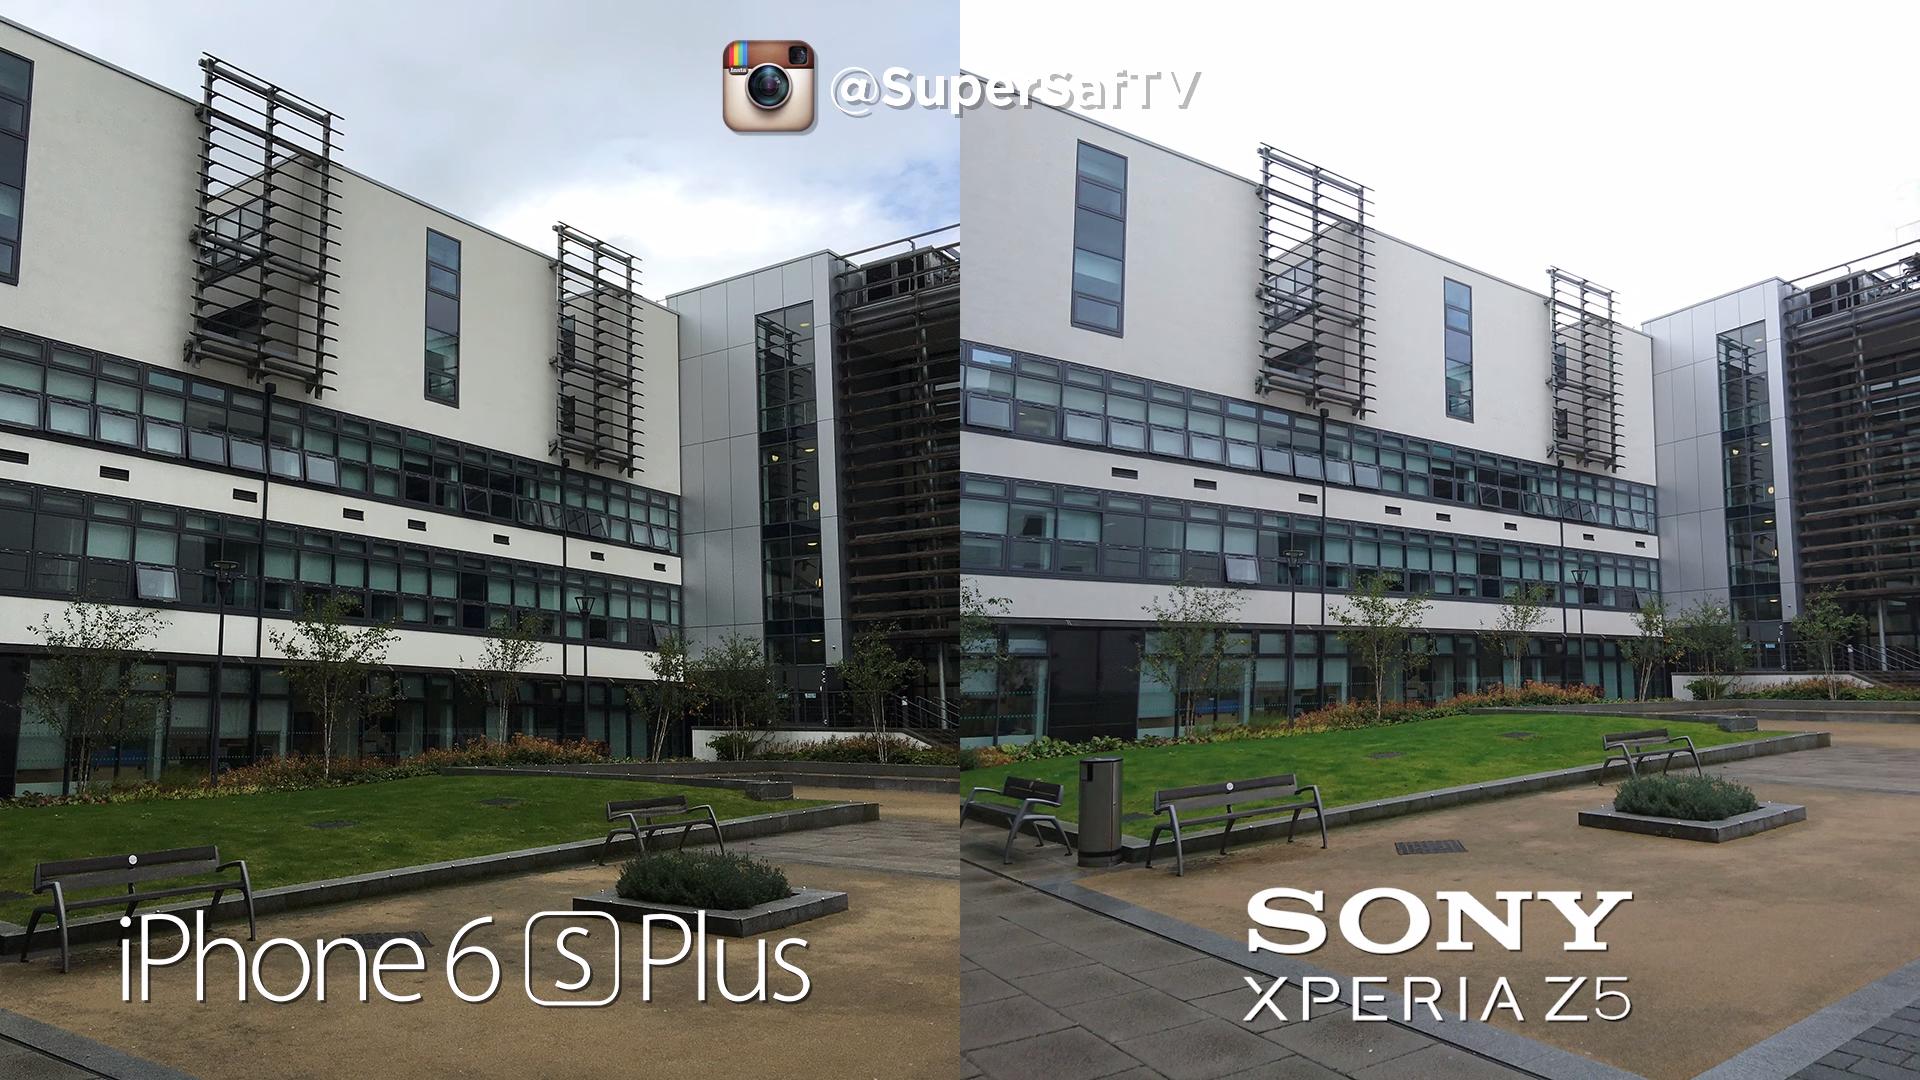 Xperia z5 vs iPhone 6s plus (5)